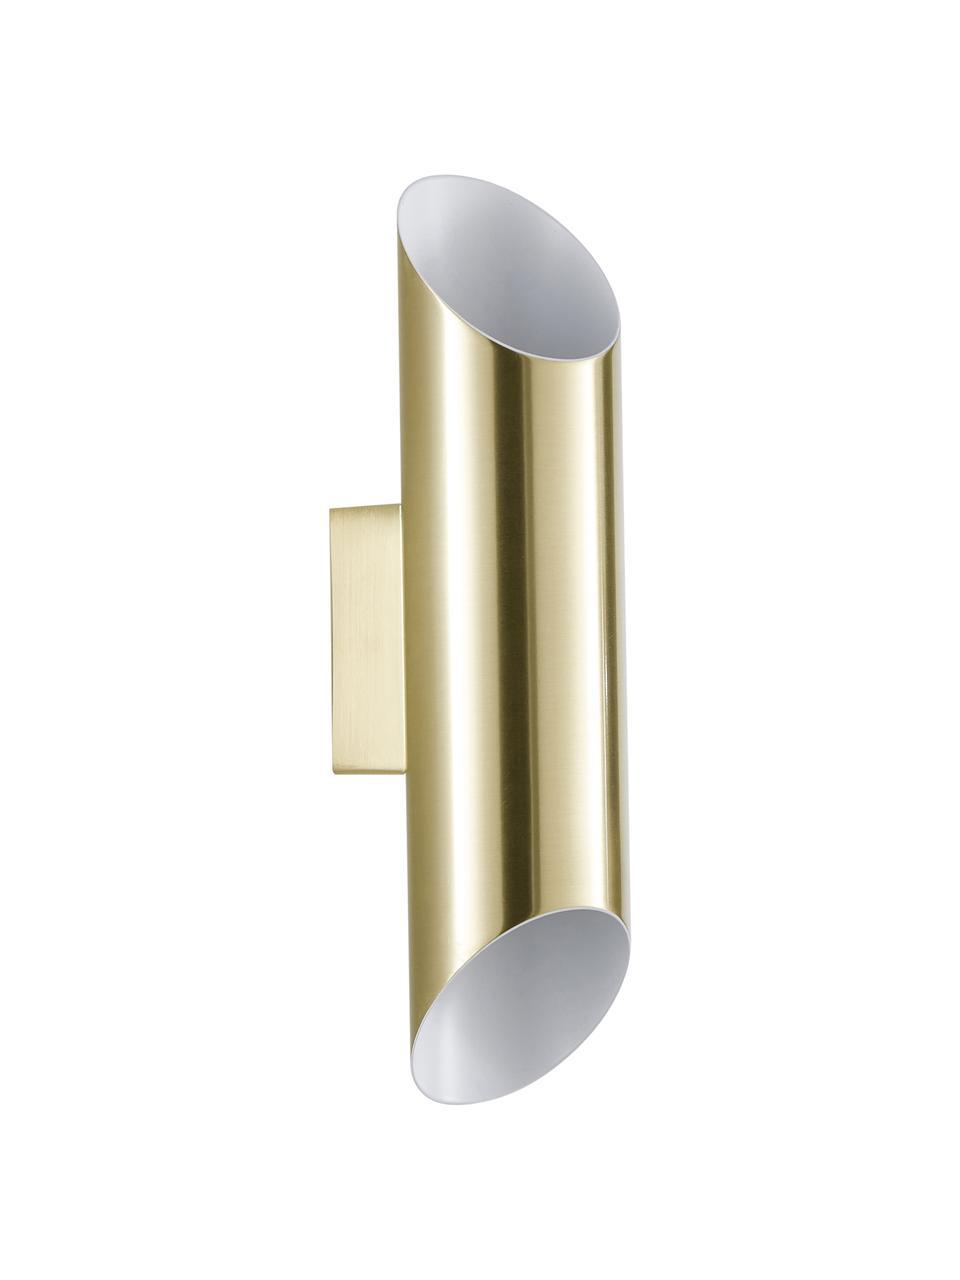 Wandlamp Renee in goudkleur, Lampenkap: geborsteld metaal, Mat goudkleurig, 7 x 28 cm